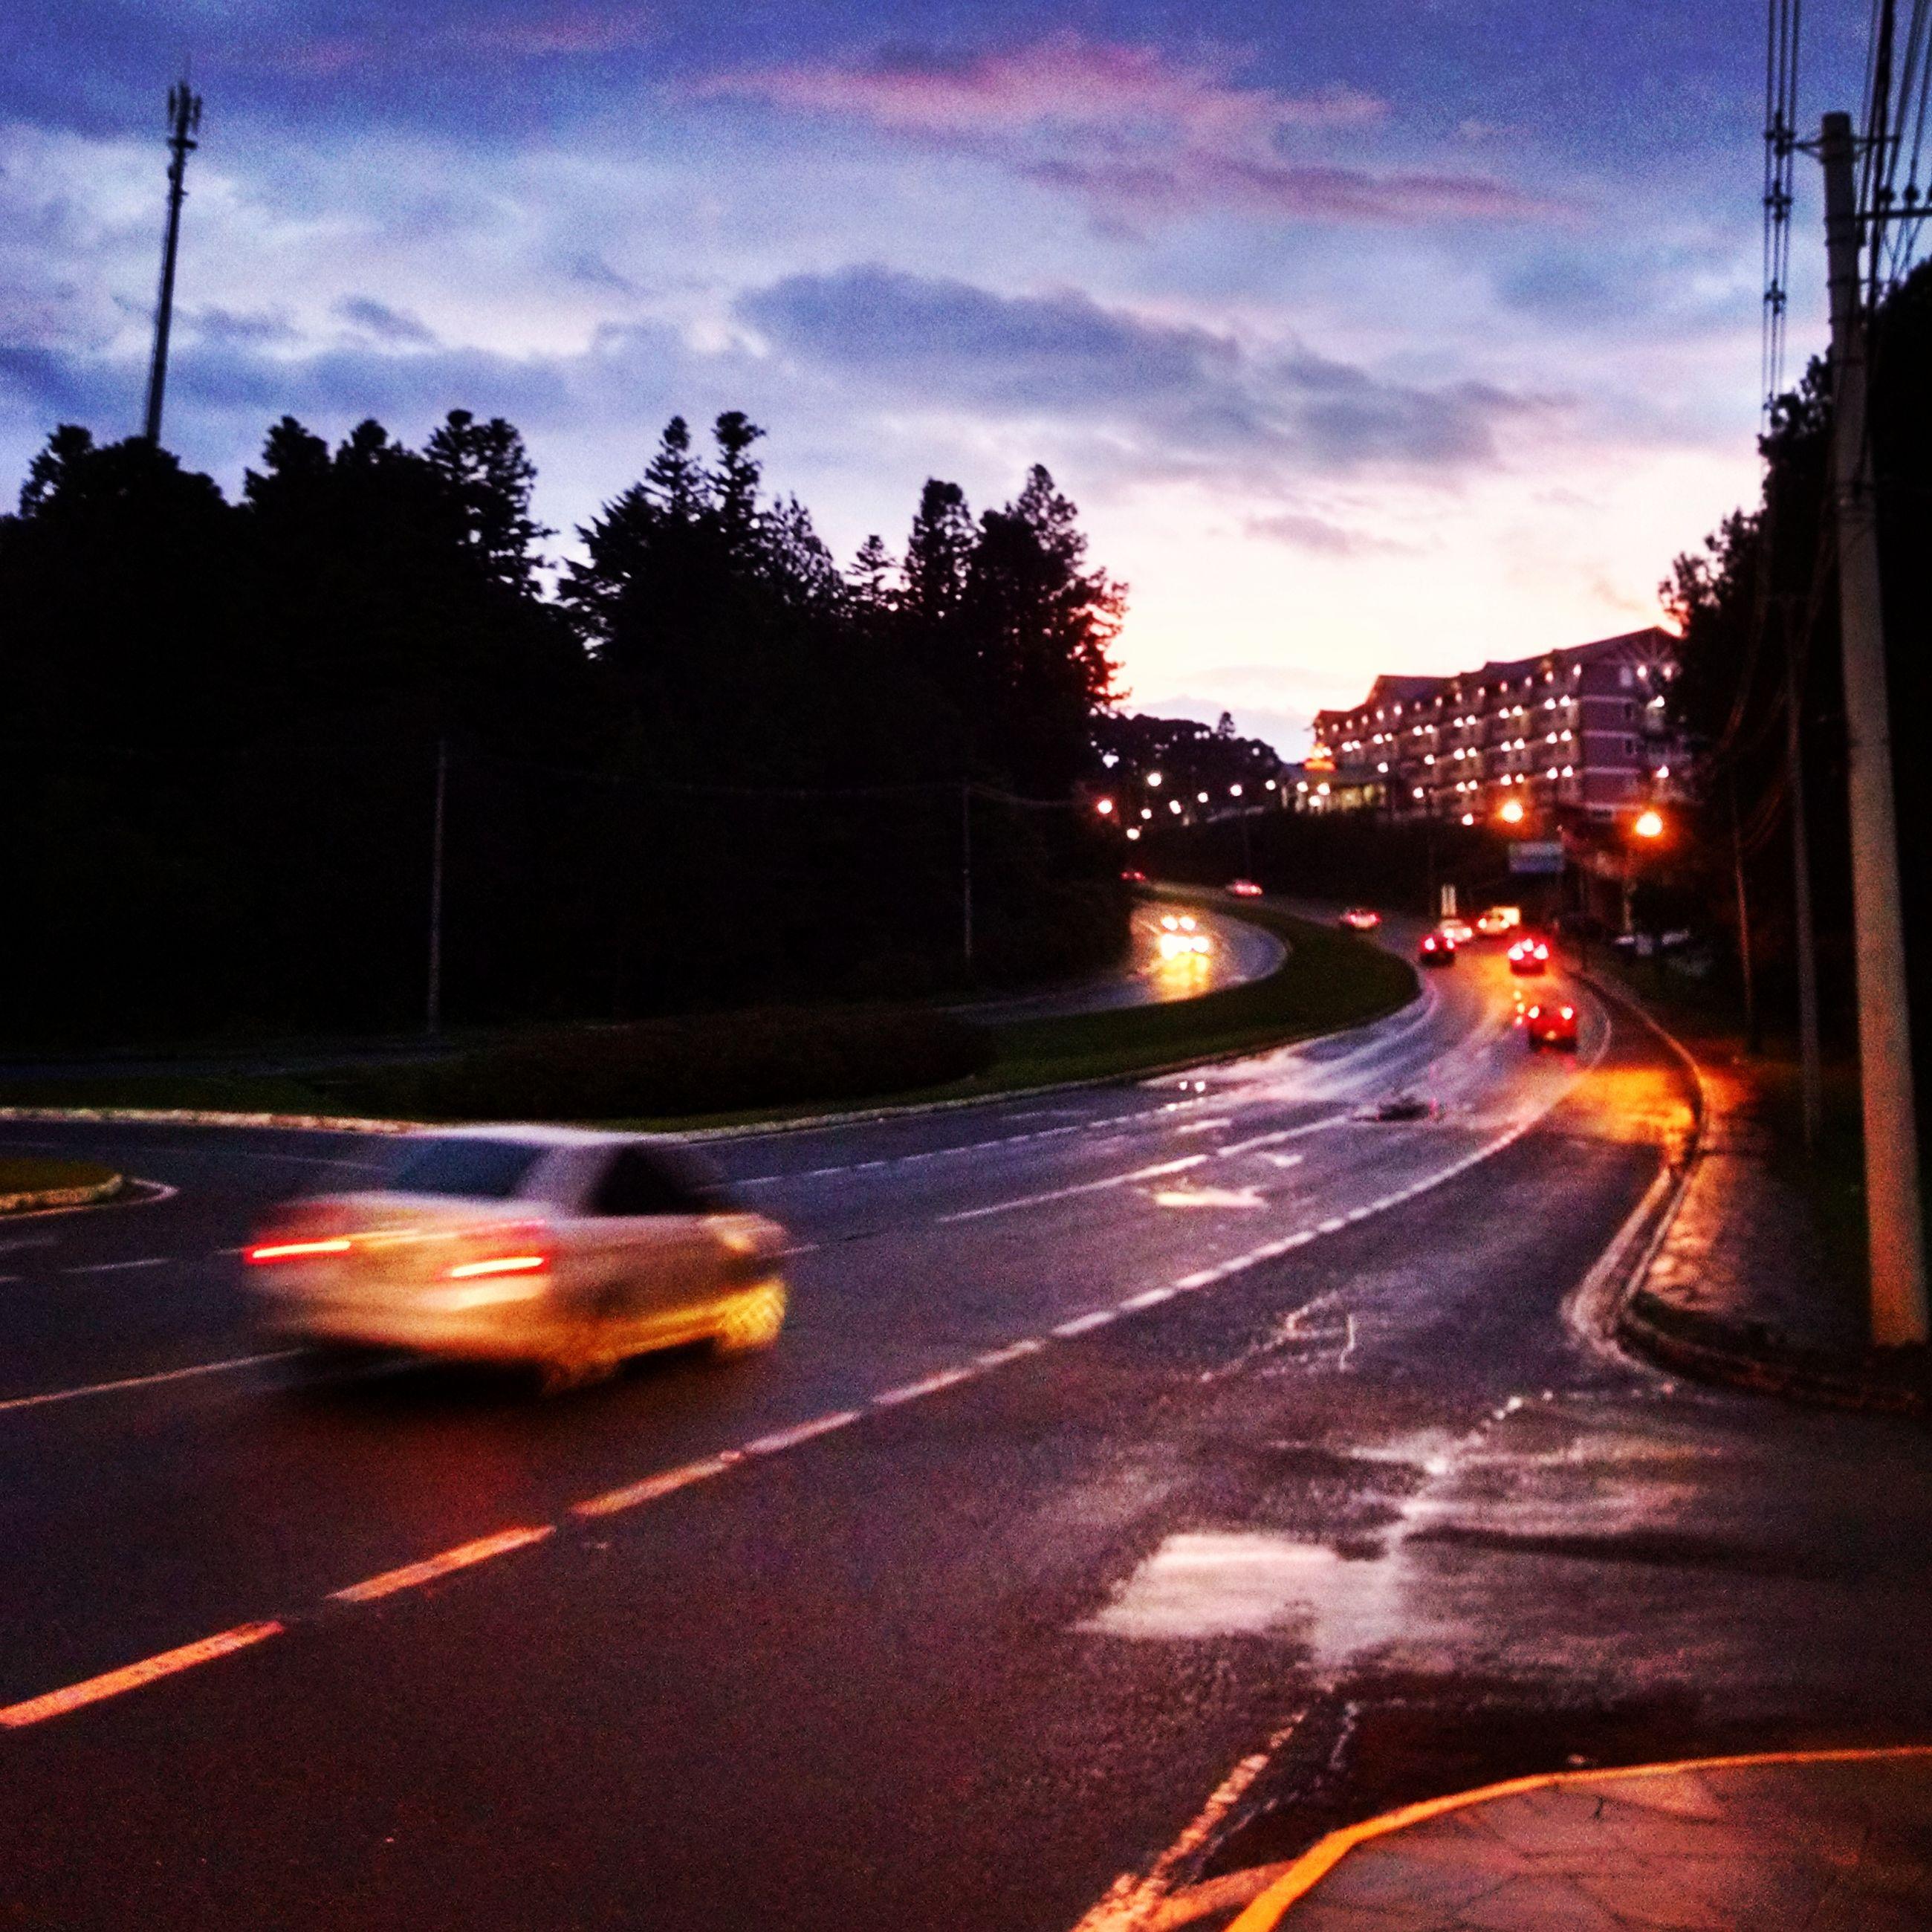 transportation, illuminated, car, road, land vehicle, mode of transport, street, street light, traffic, sky, road marking, the way forward, city, night, on the move, speed, motion, city street, light trail, long exposure